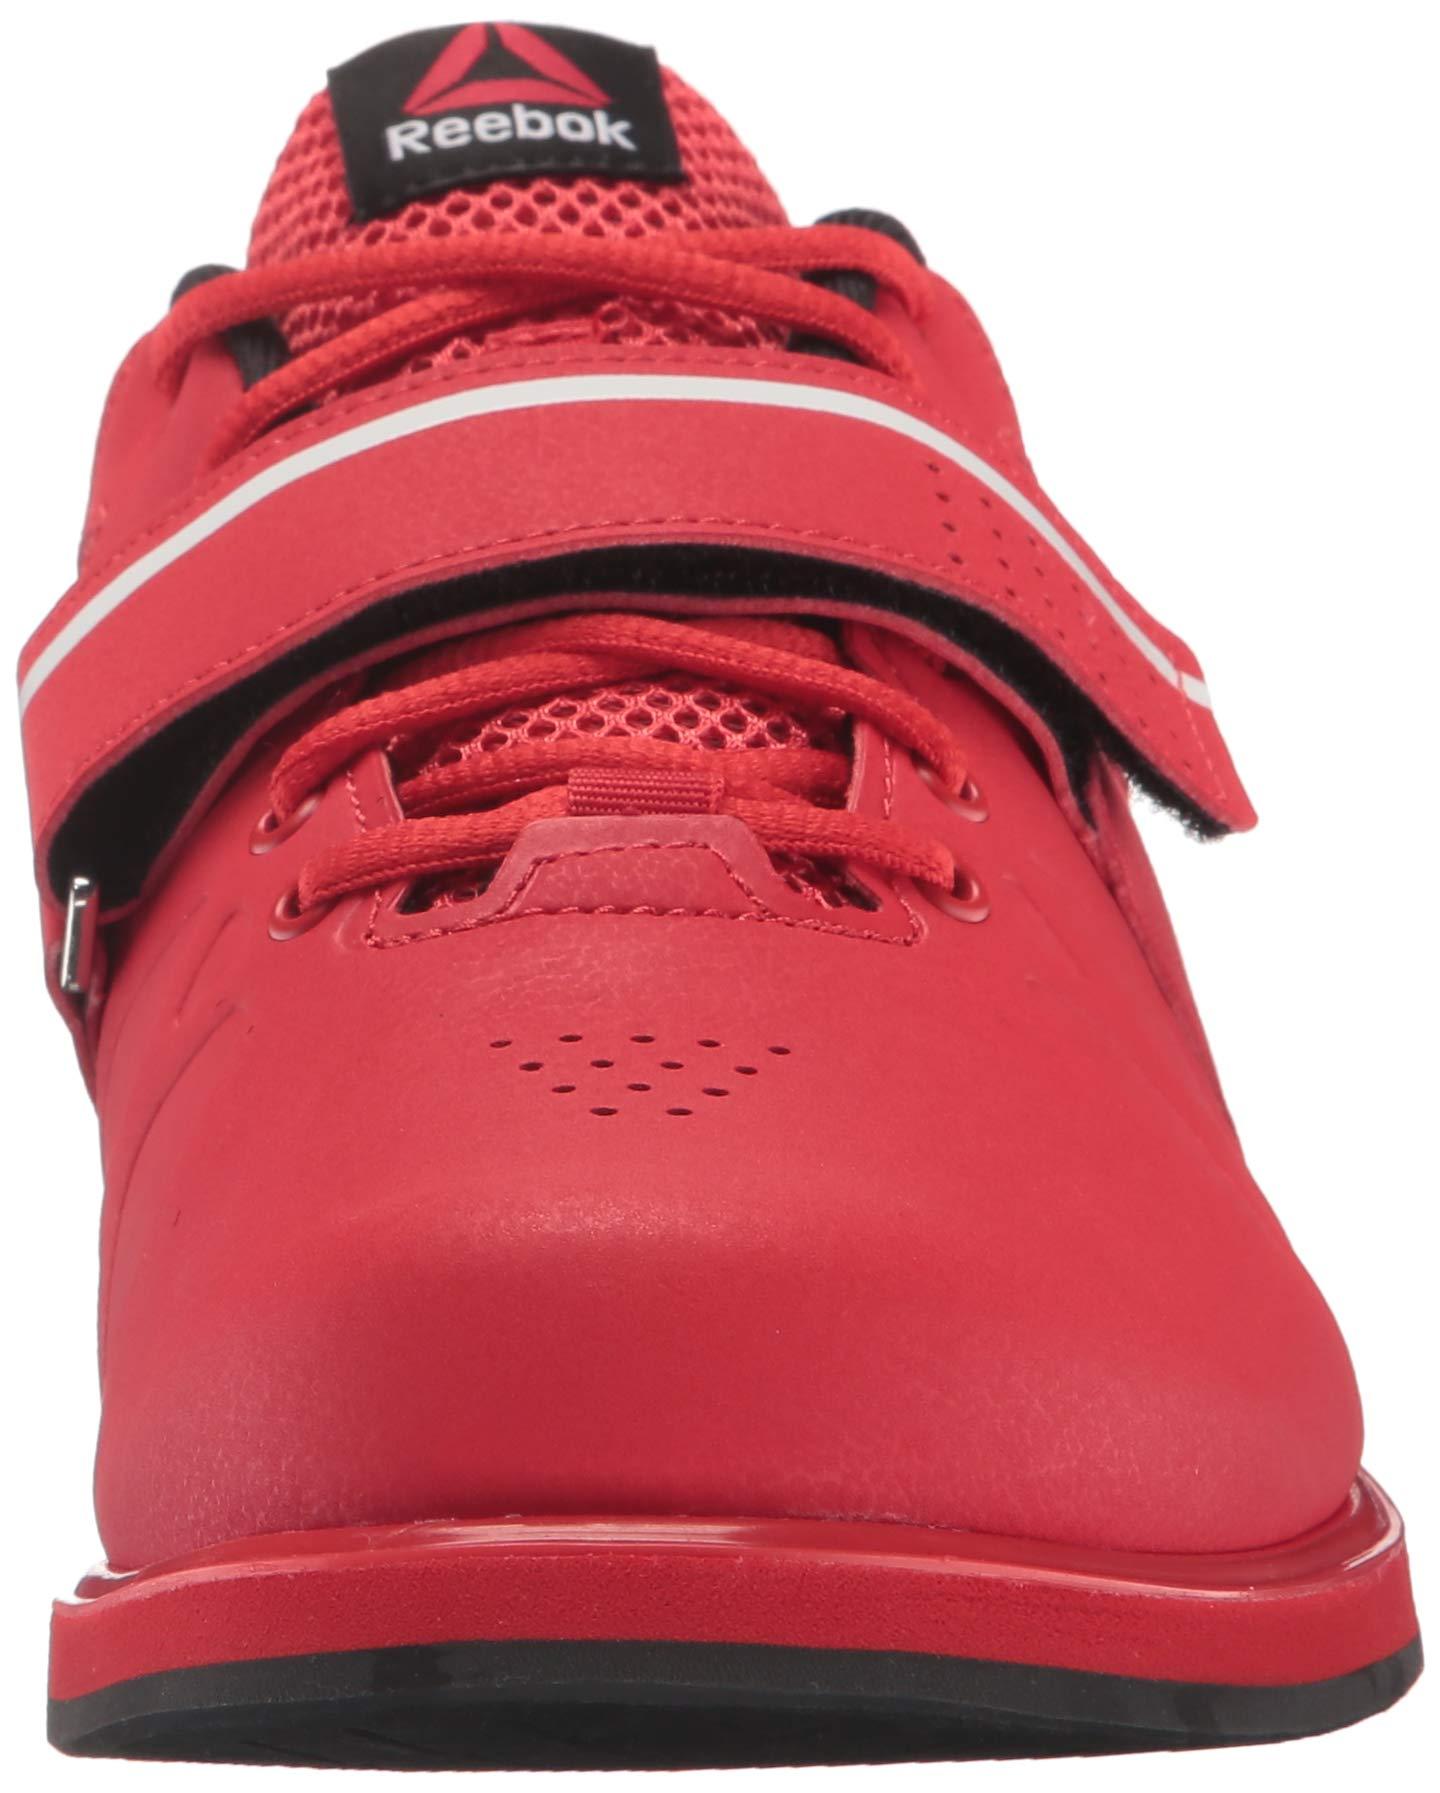 Reebok Men's Lifter Pr Cross-Trainer Shoe, Primal Red/Black/White, 7.5 M US by Reebok (Image #4)